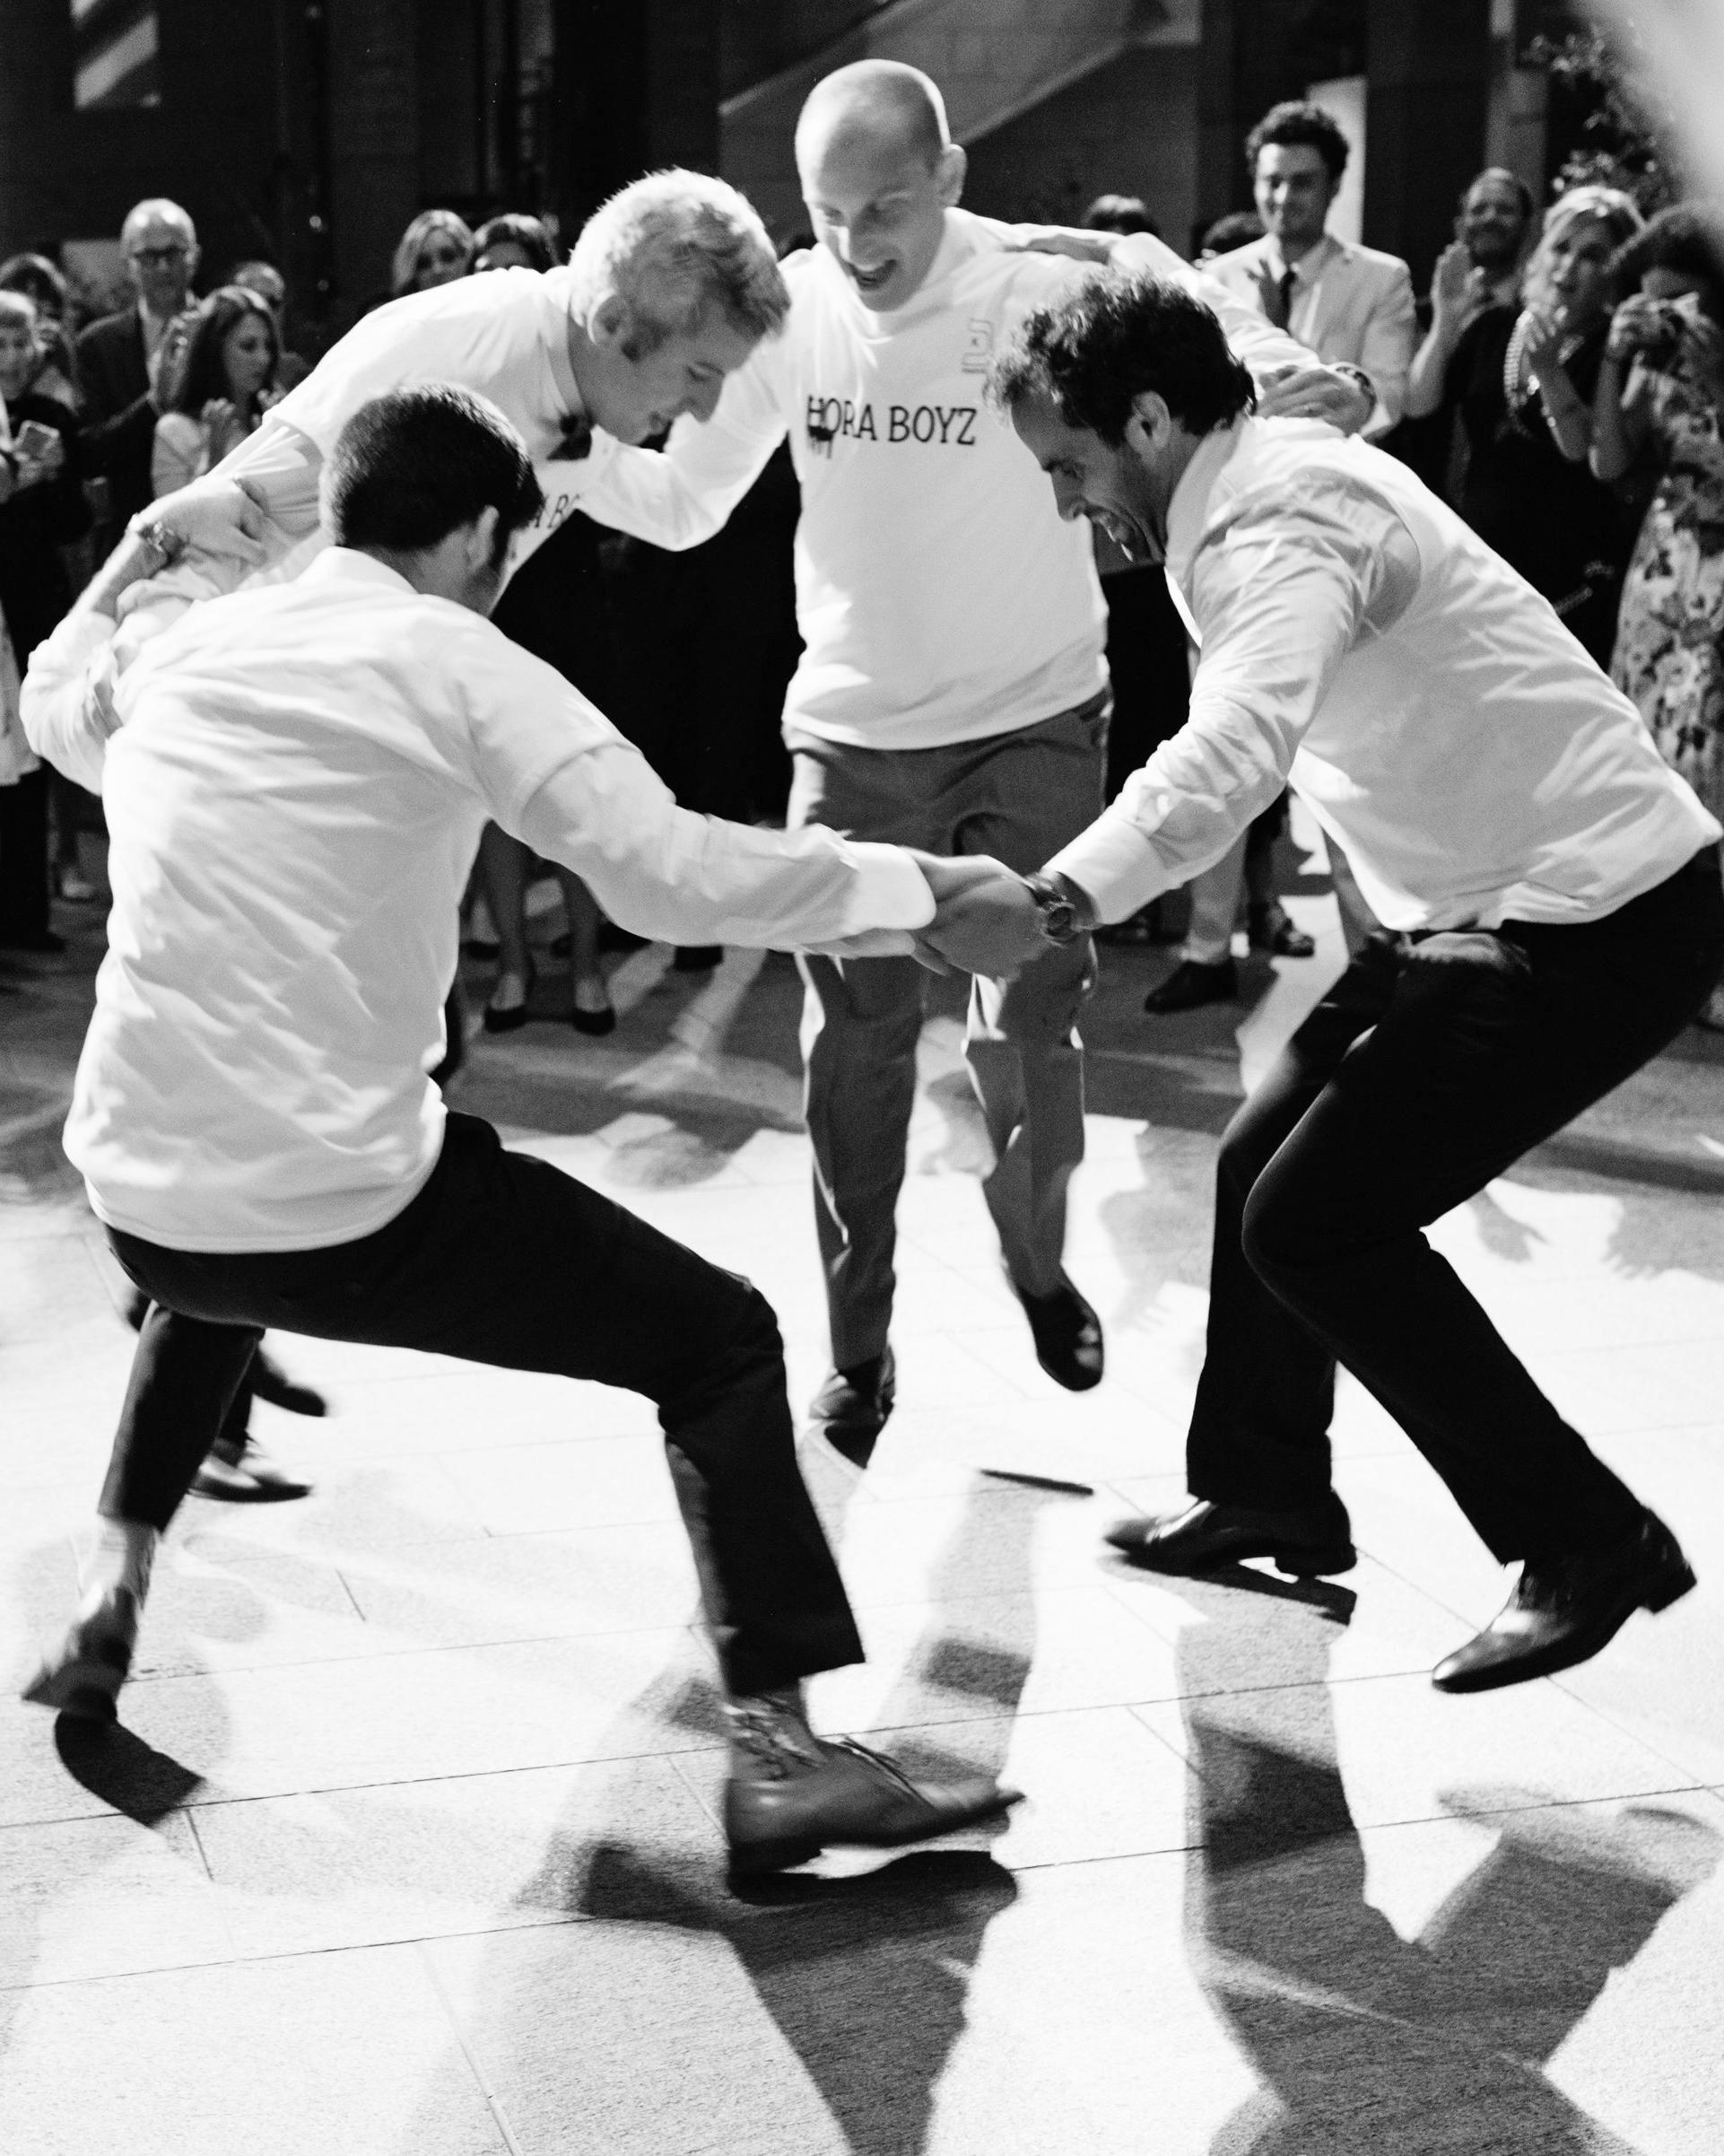 molly michael wedding hora dance